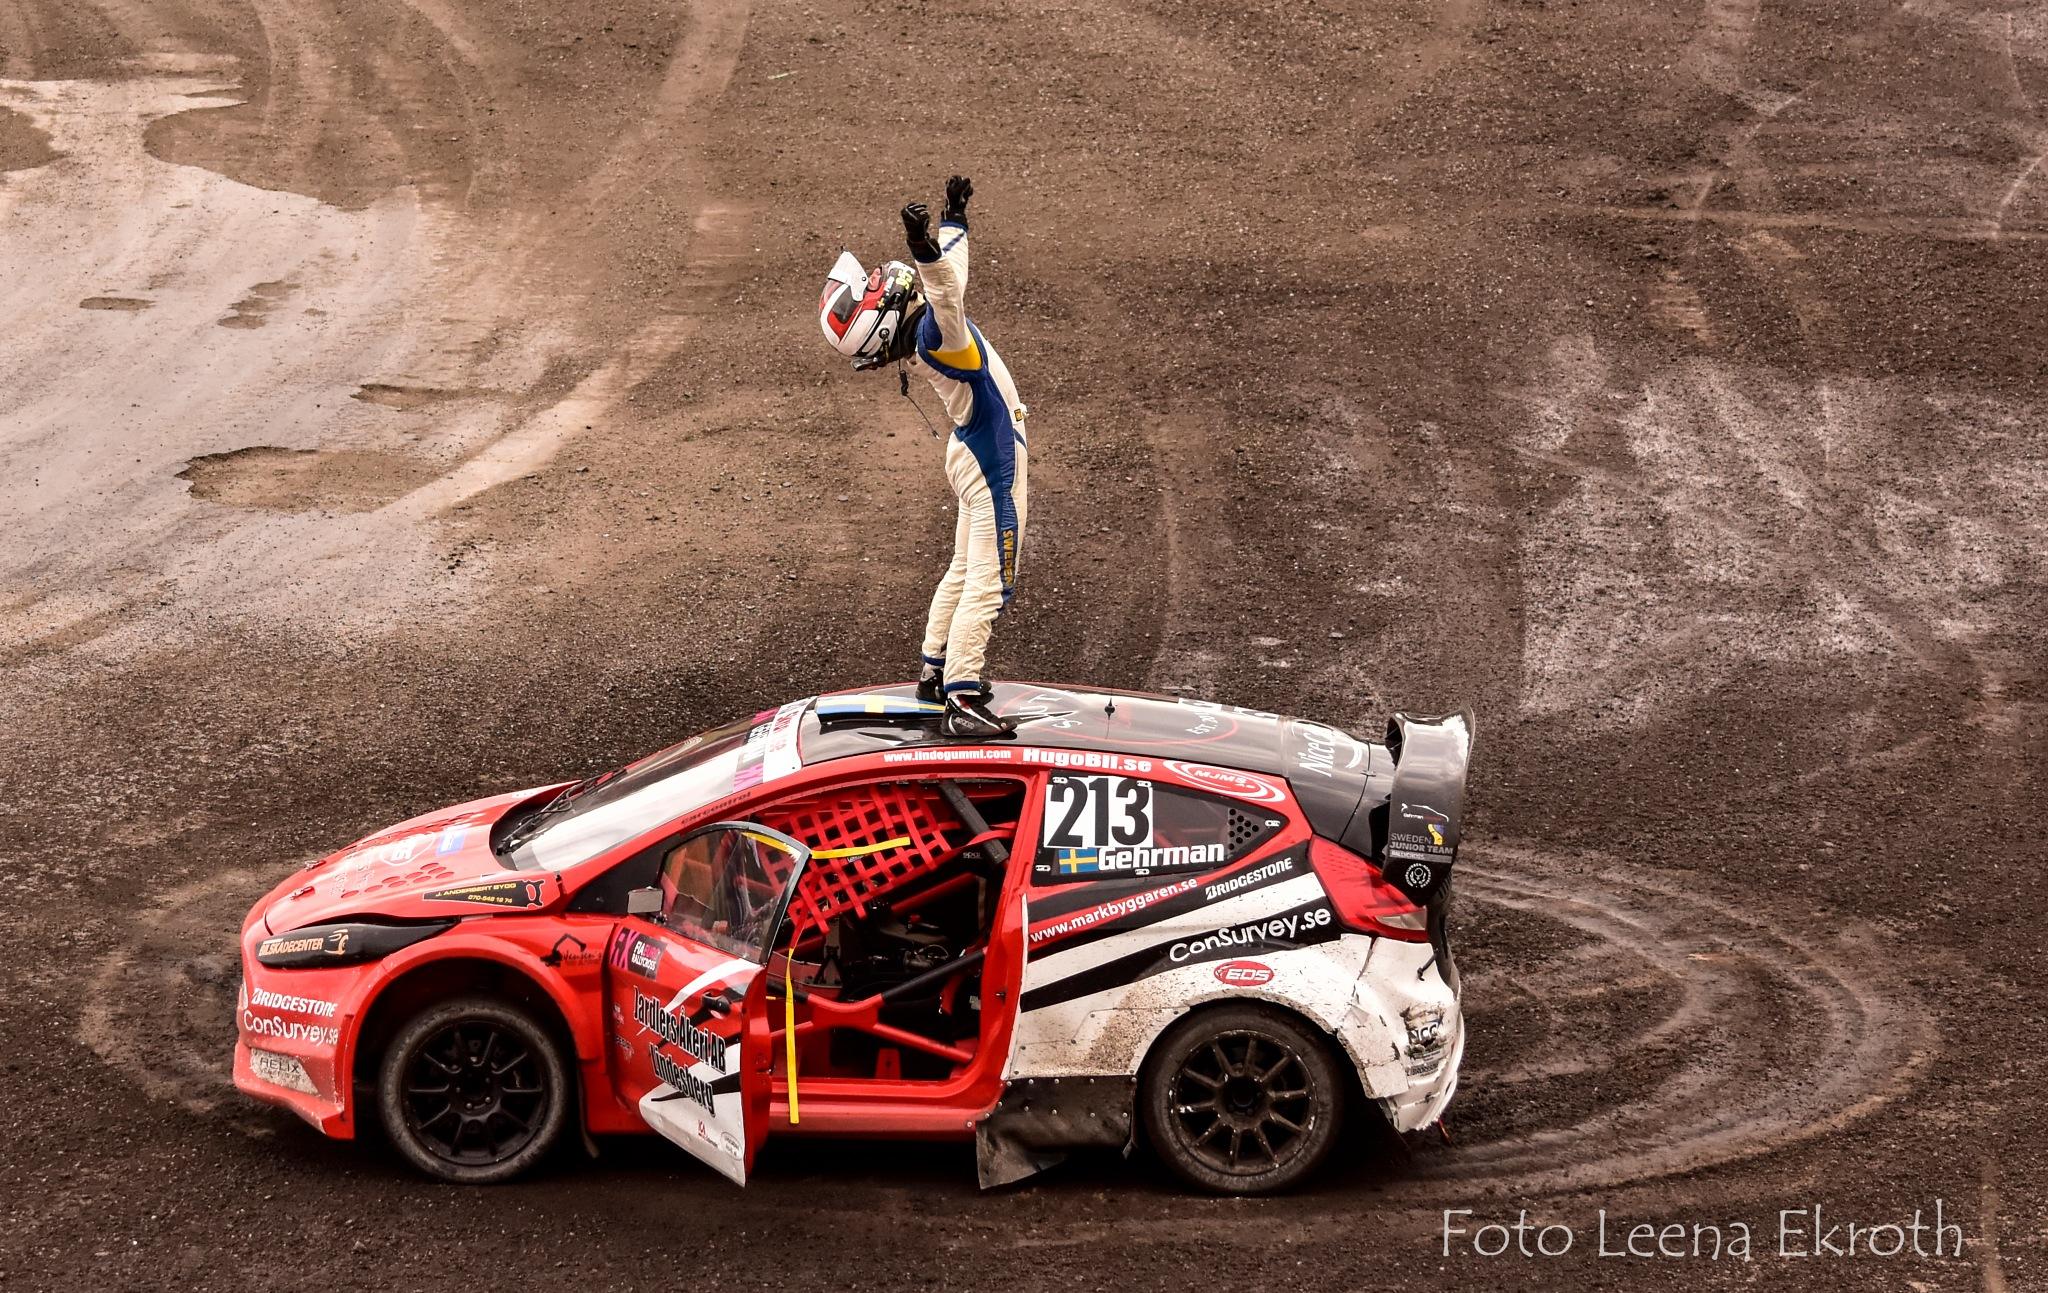 Swedish Masters in Rallycross,1 by leena.ekroth